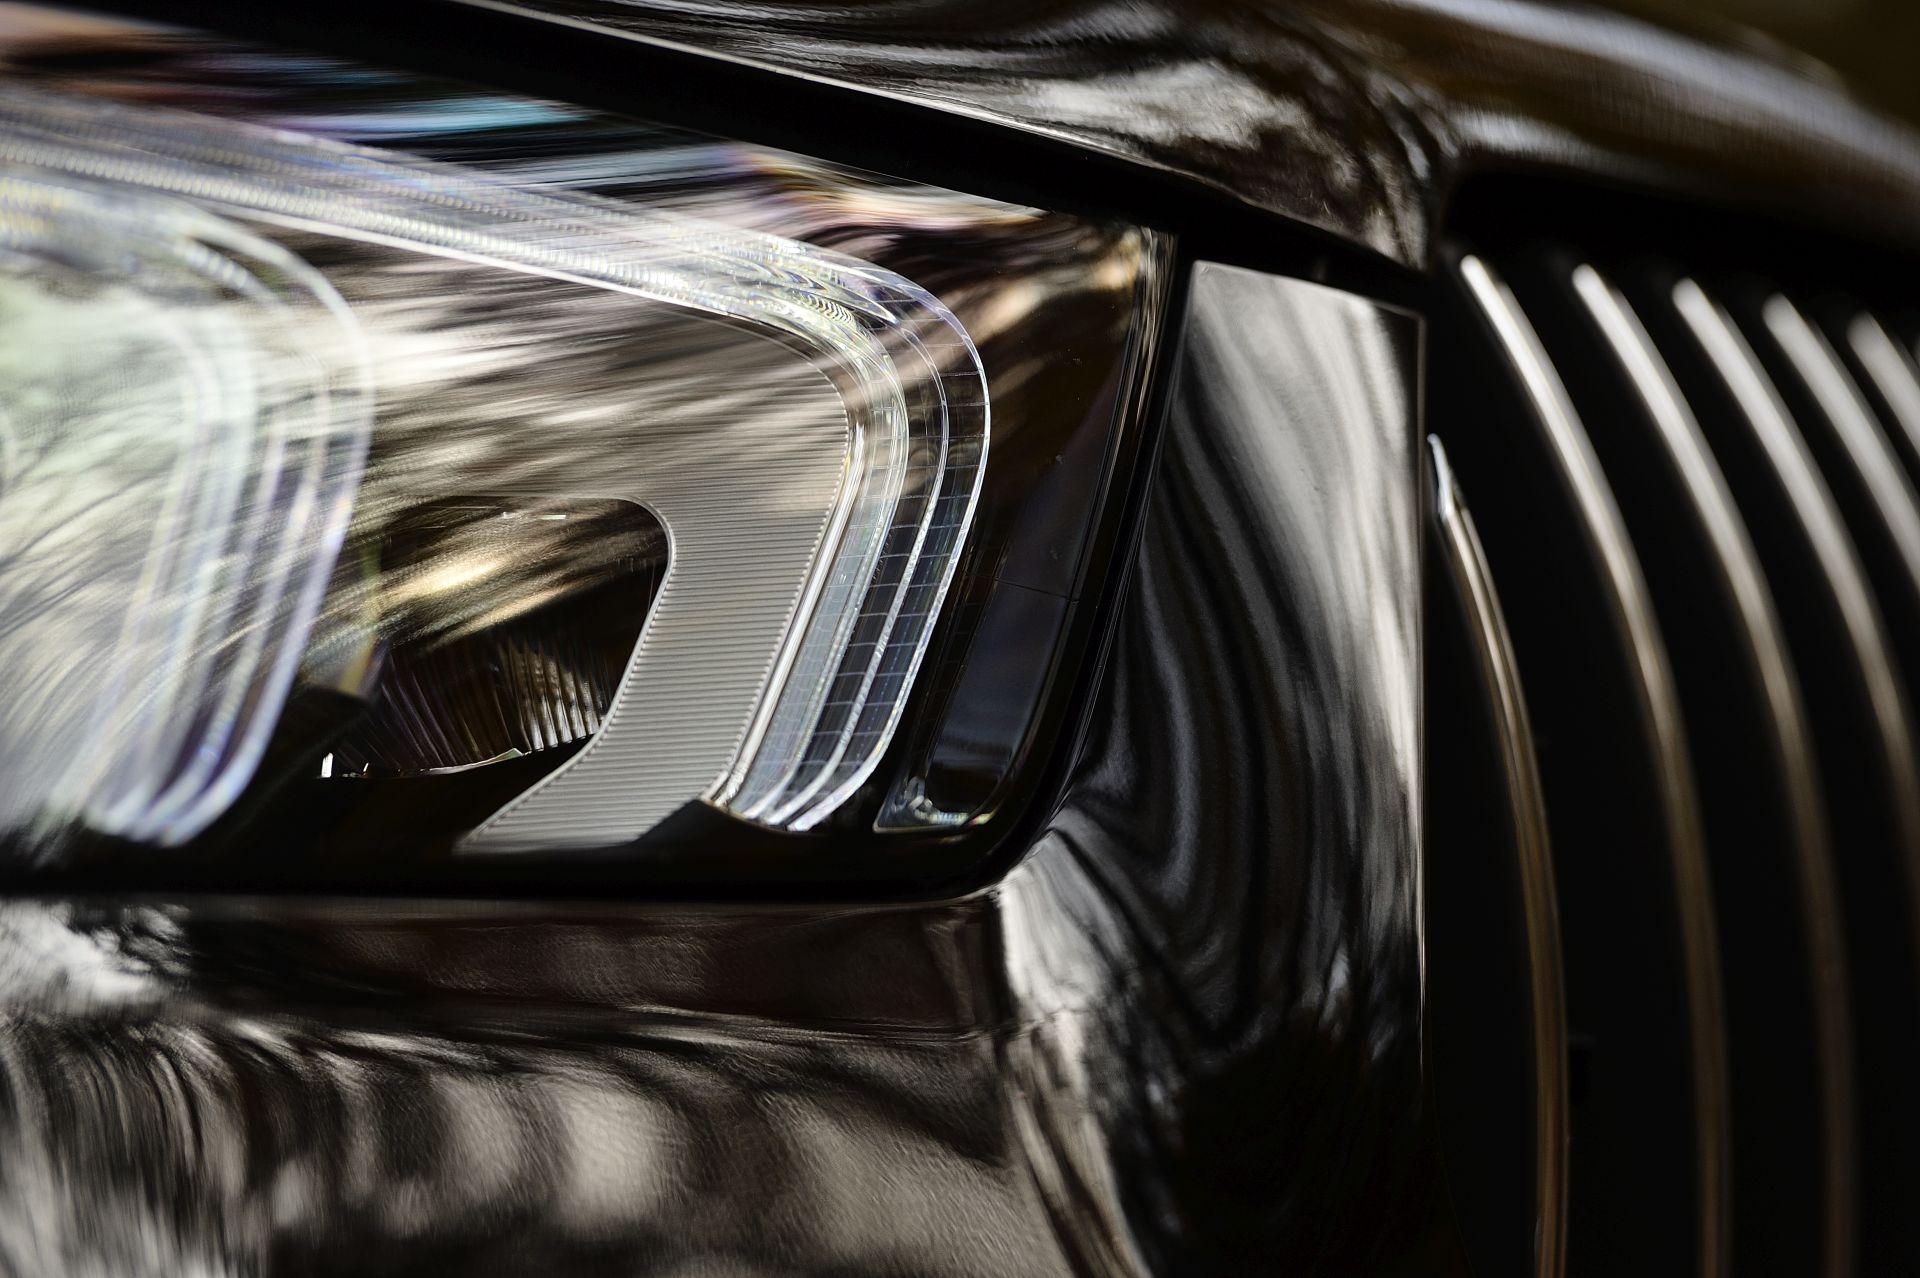 far Mercedes-AMG GLE 53 4MATIC+ Coupé